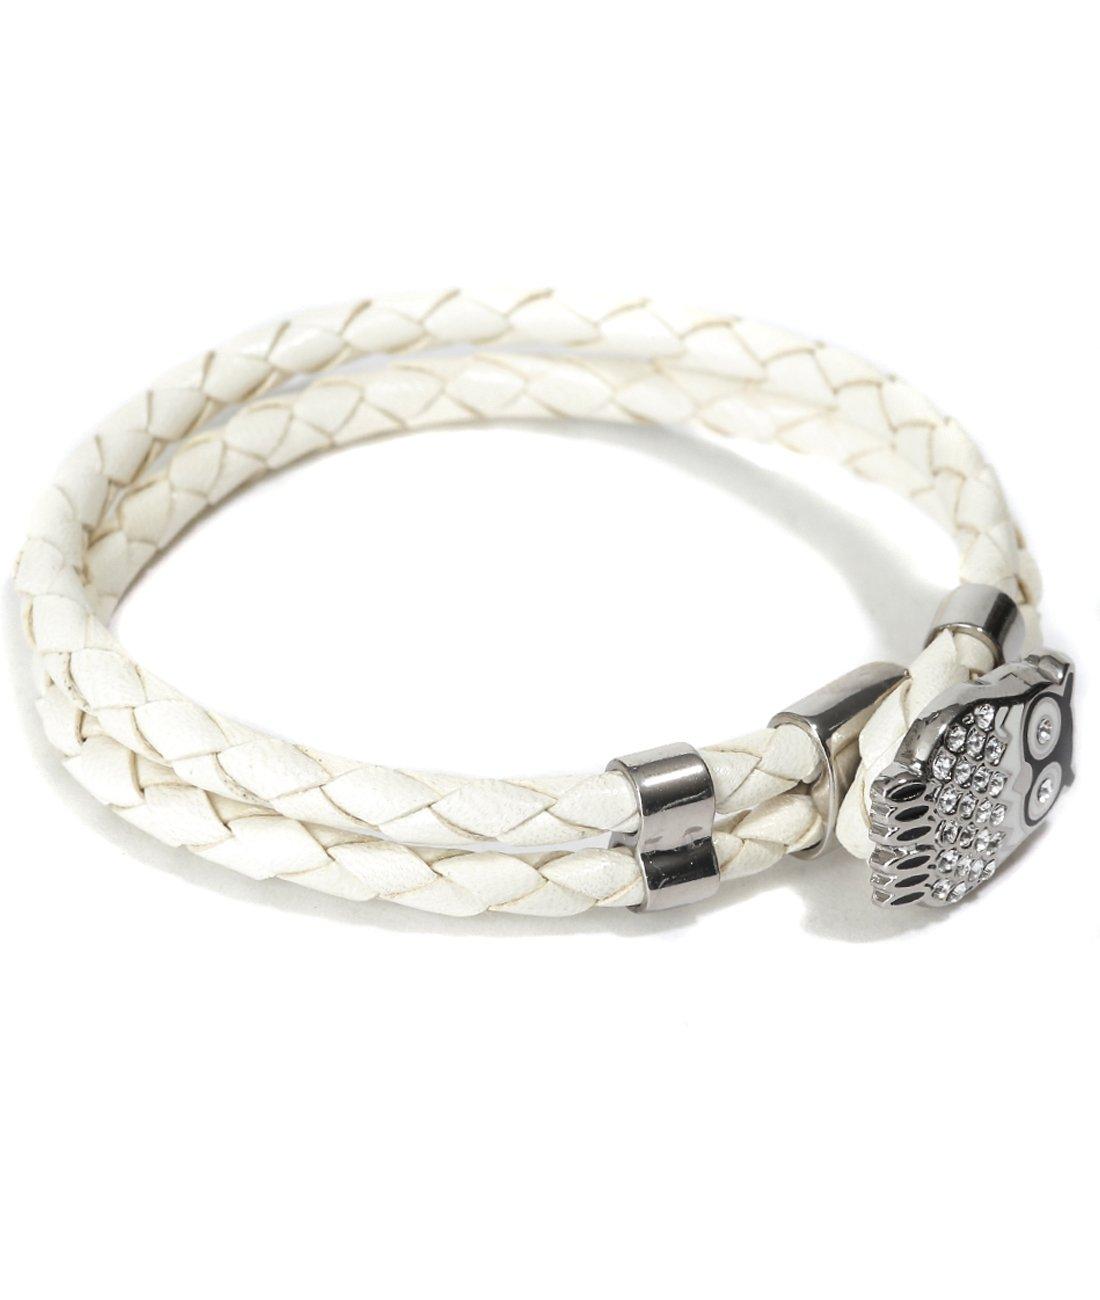 Mon Art Women's Braided Bracelet Embellished with Owl Toggle Closure L Ivory